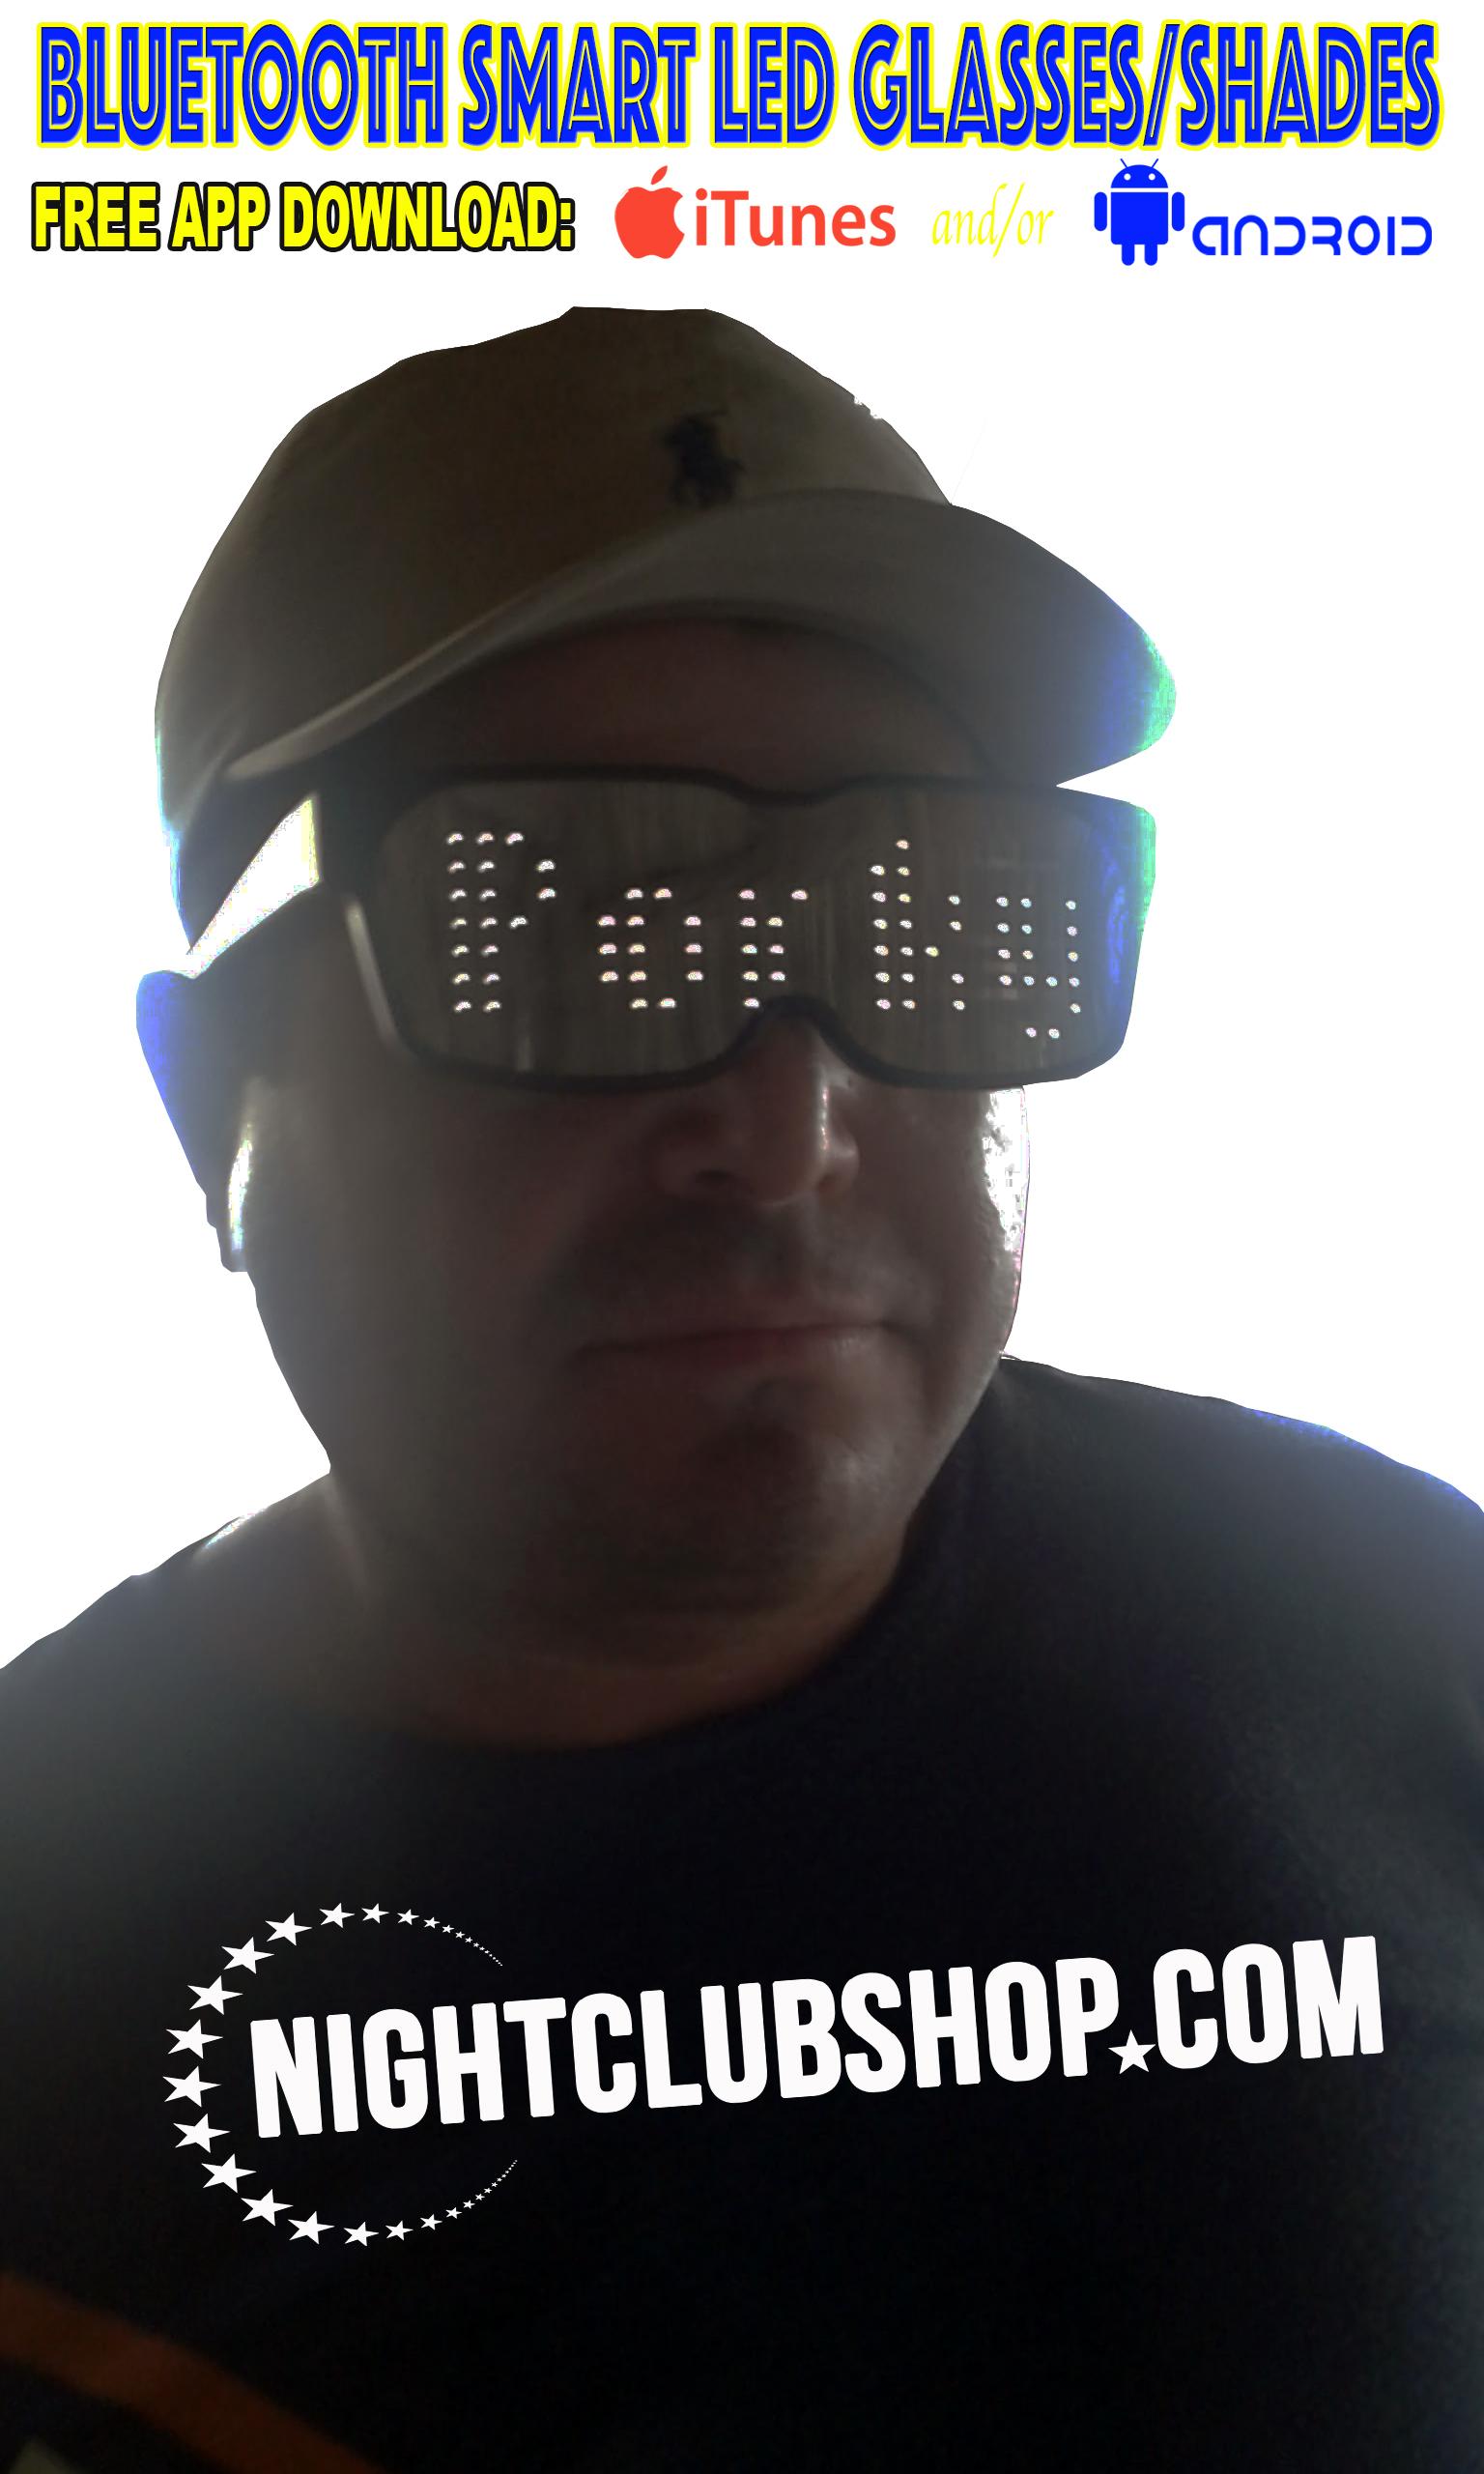 chemion-led-sunglasses-glasses-bluetooth-led-shades-porky-love-nightclubshop.jpg